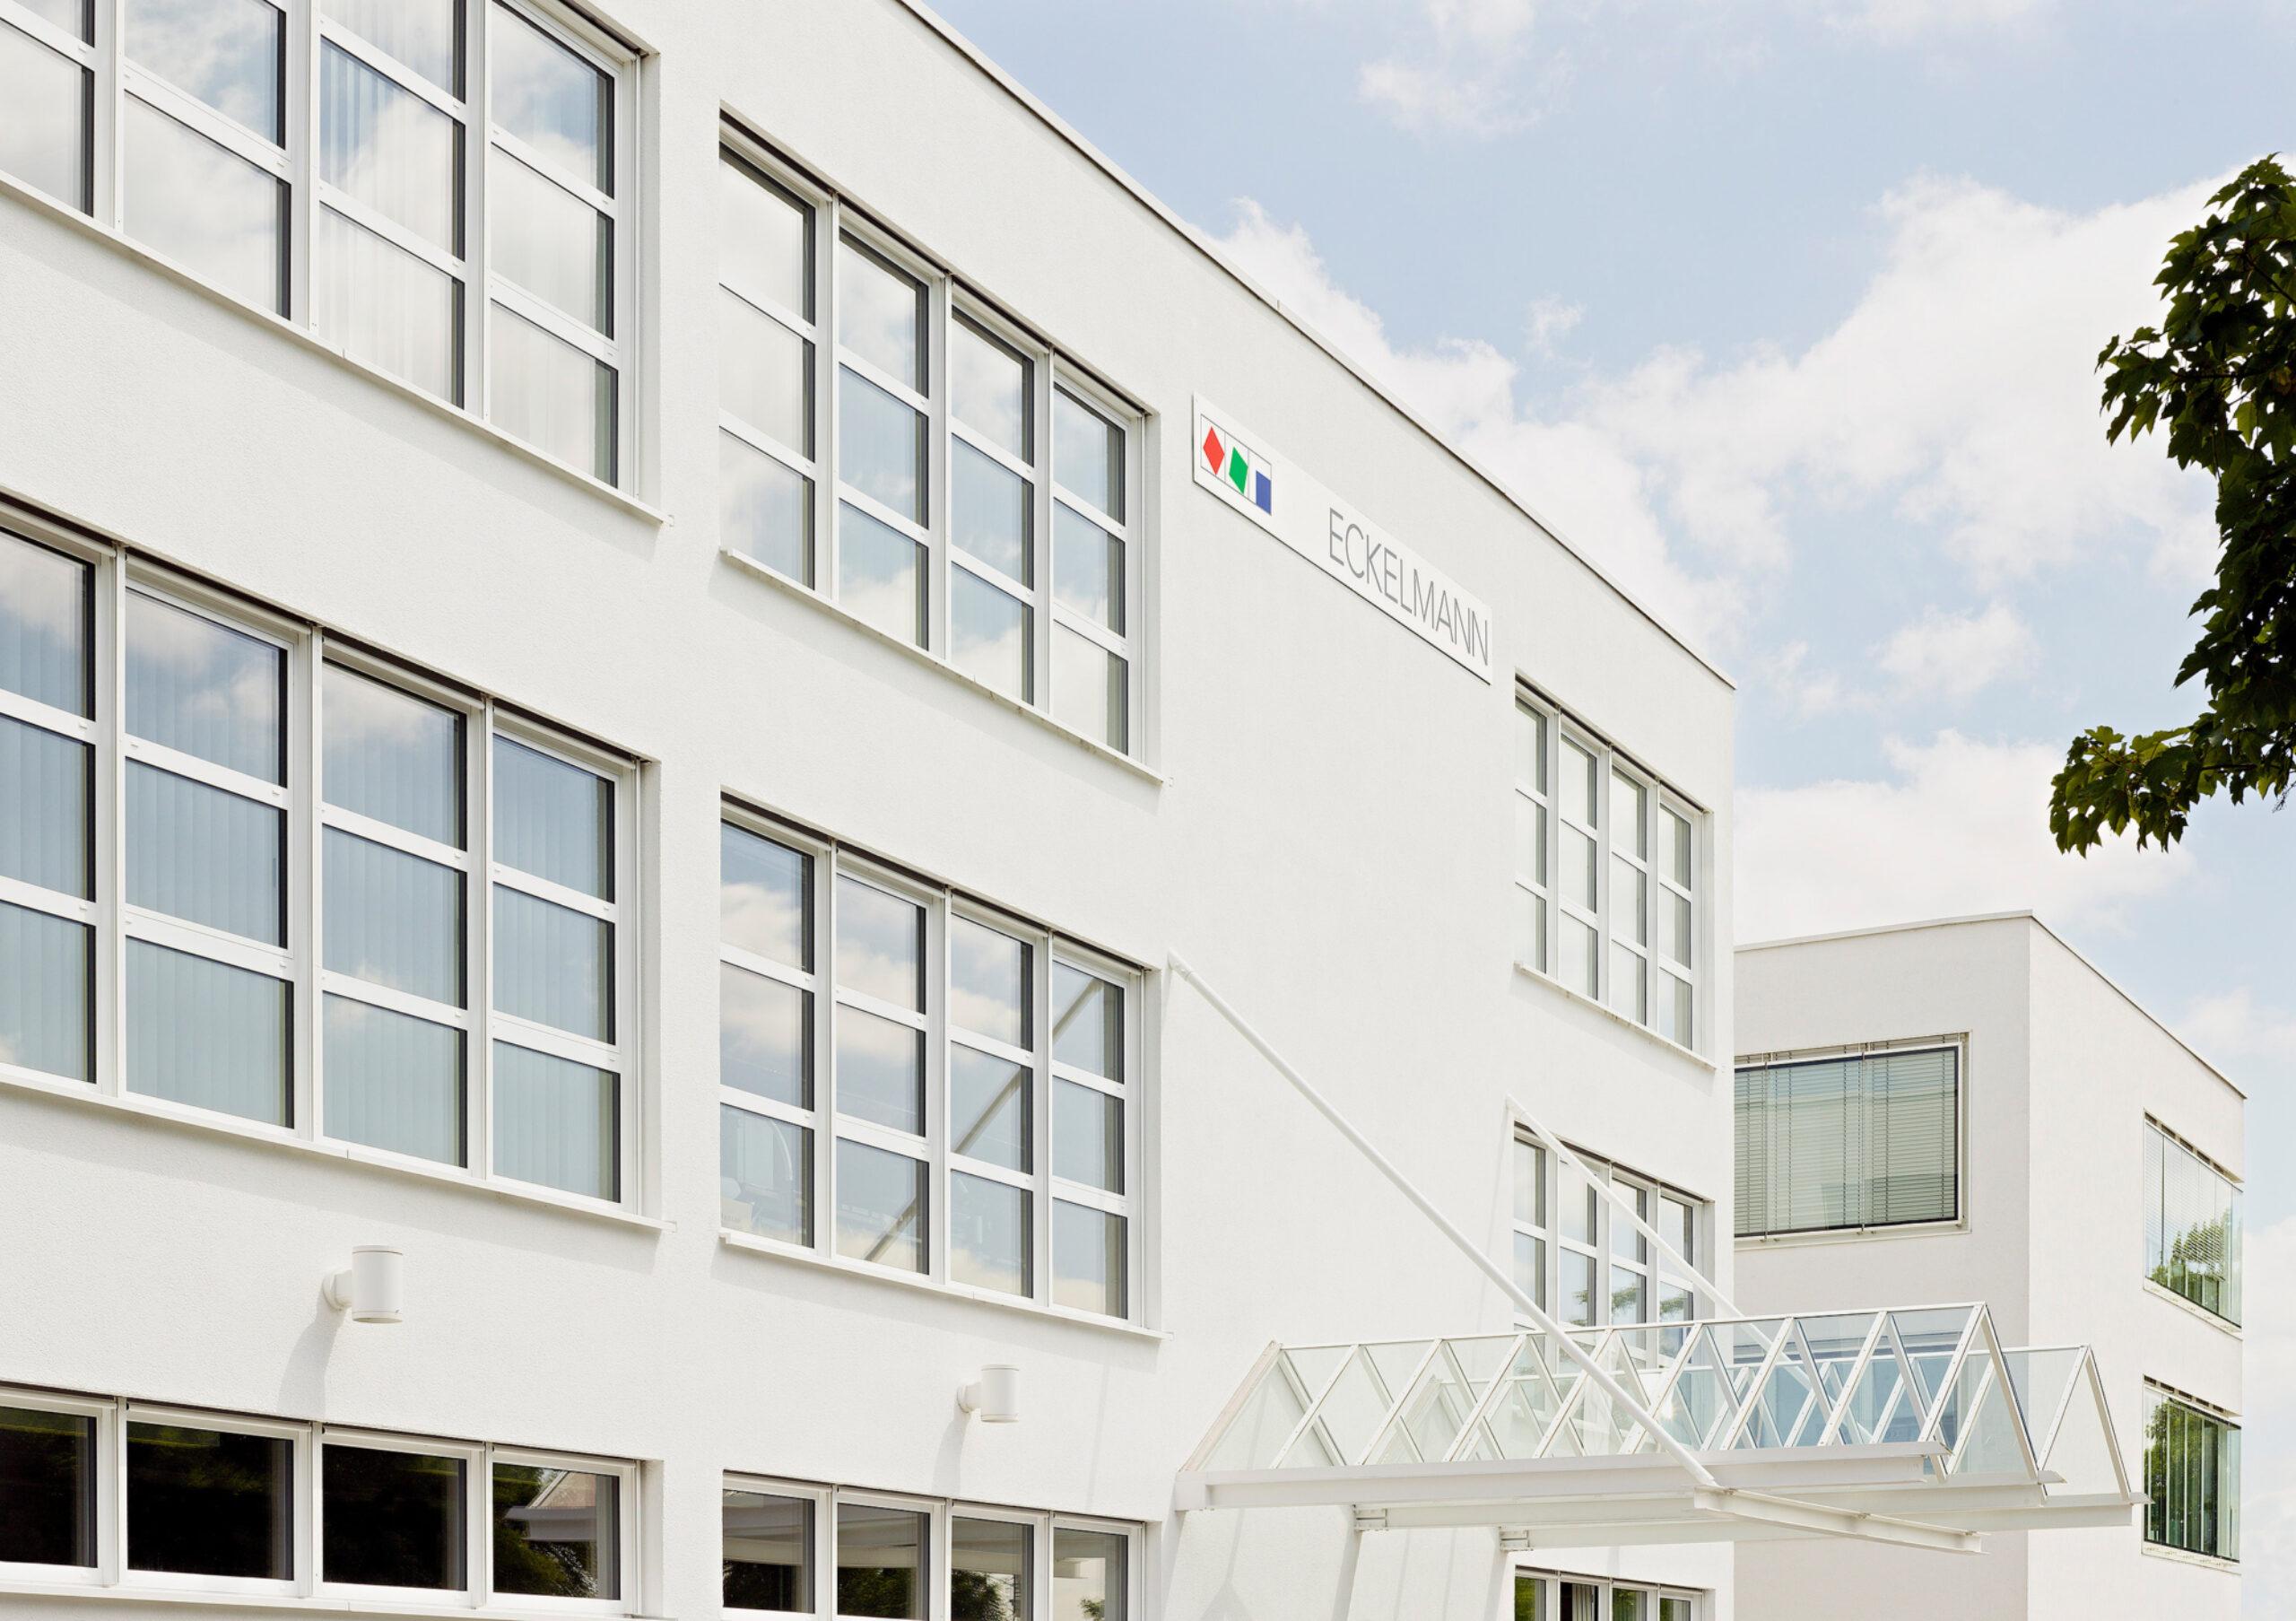 Eckelmann Fassadensanierung Wiesbaden 01